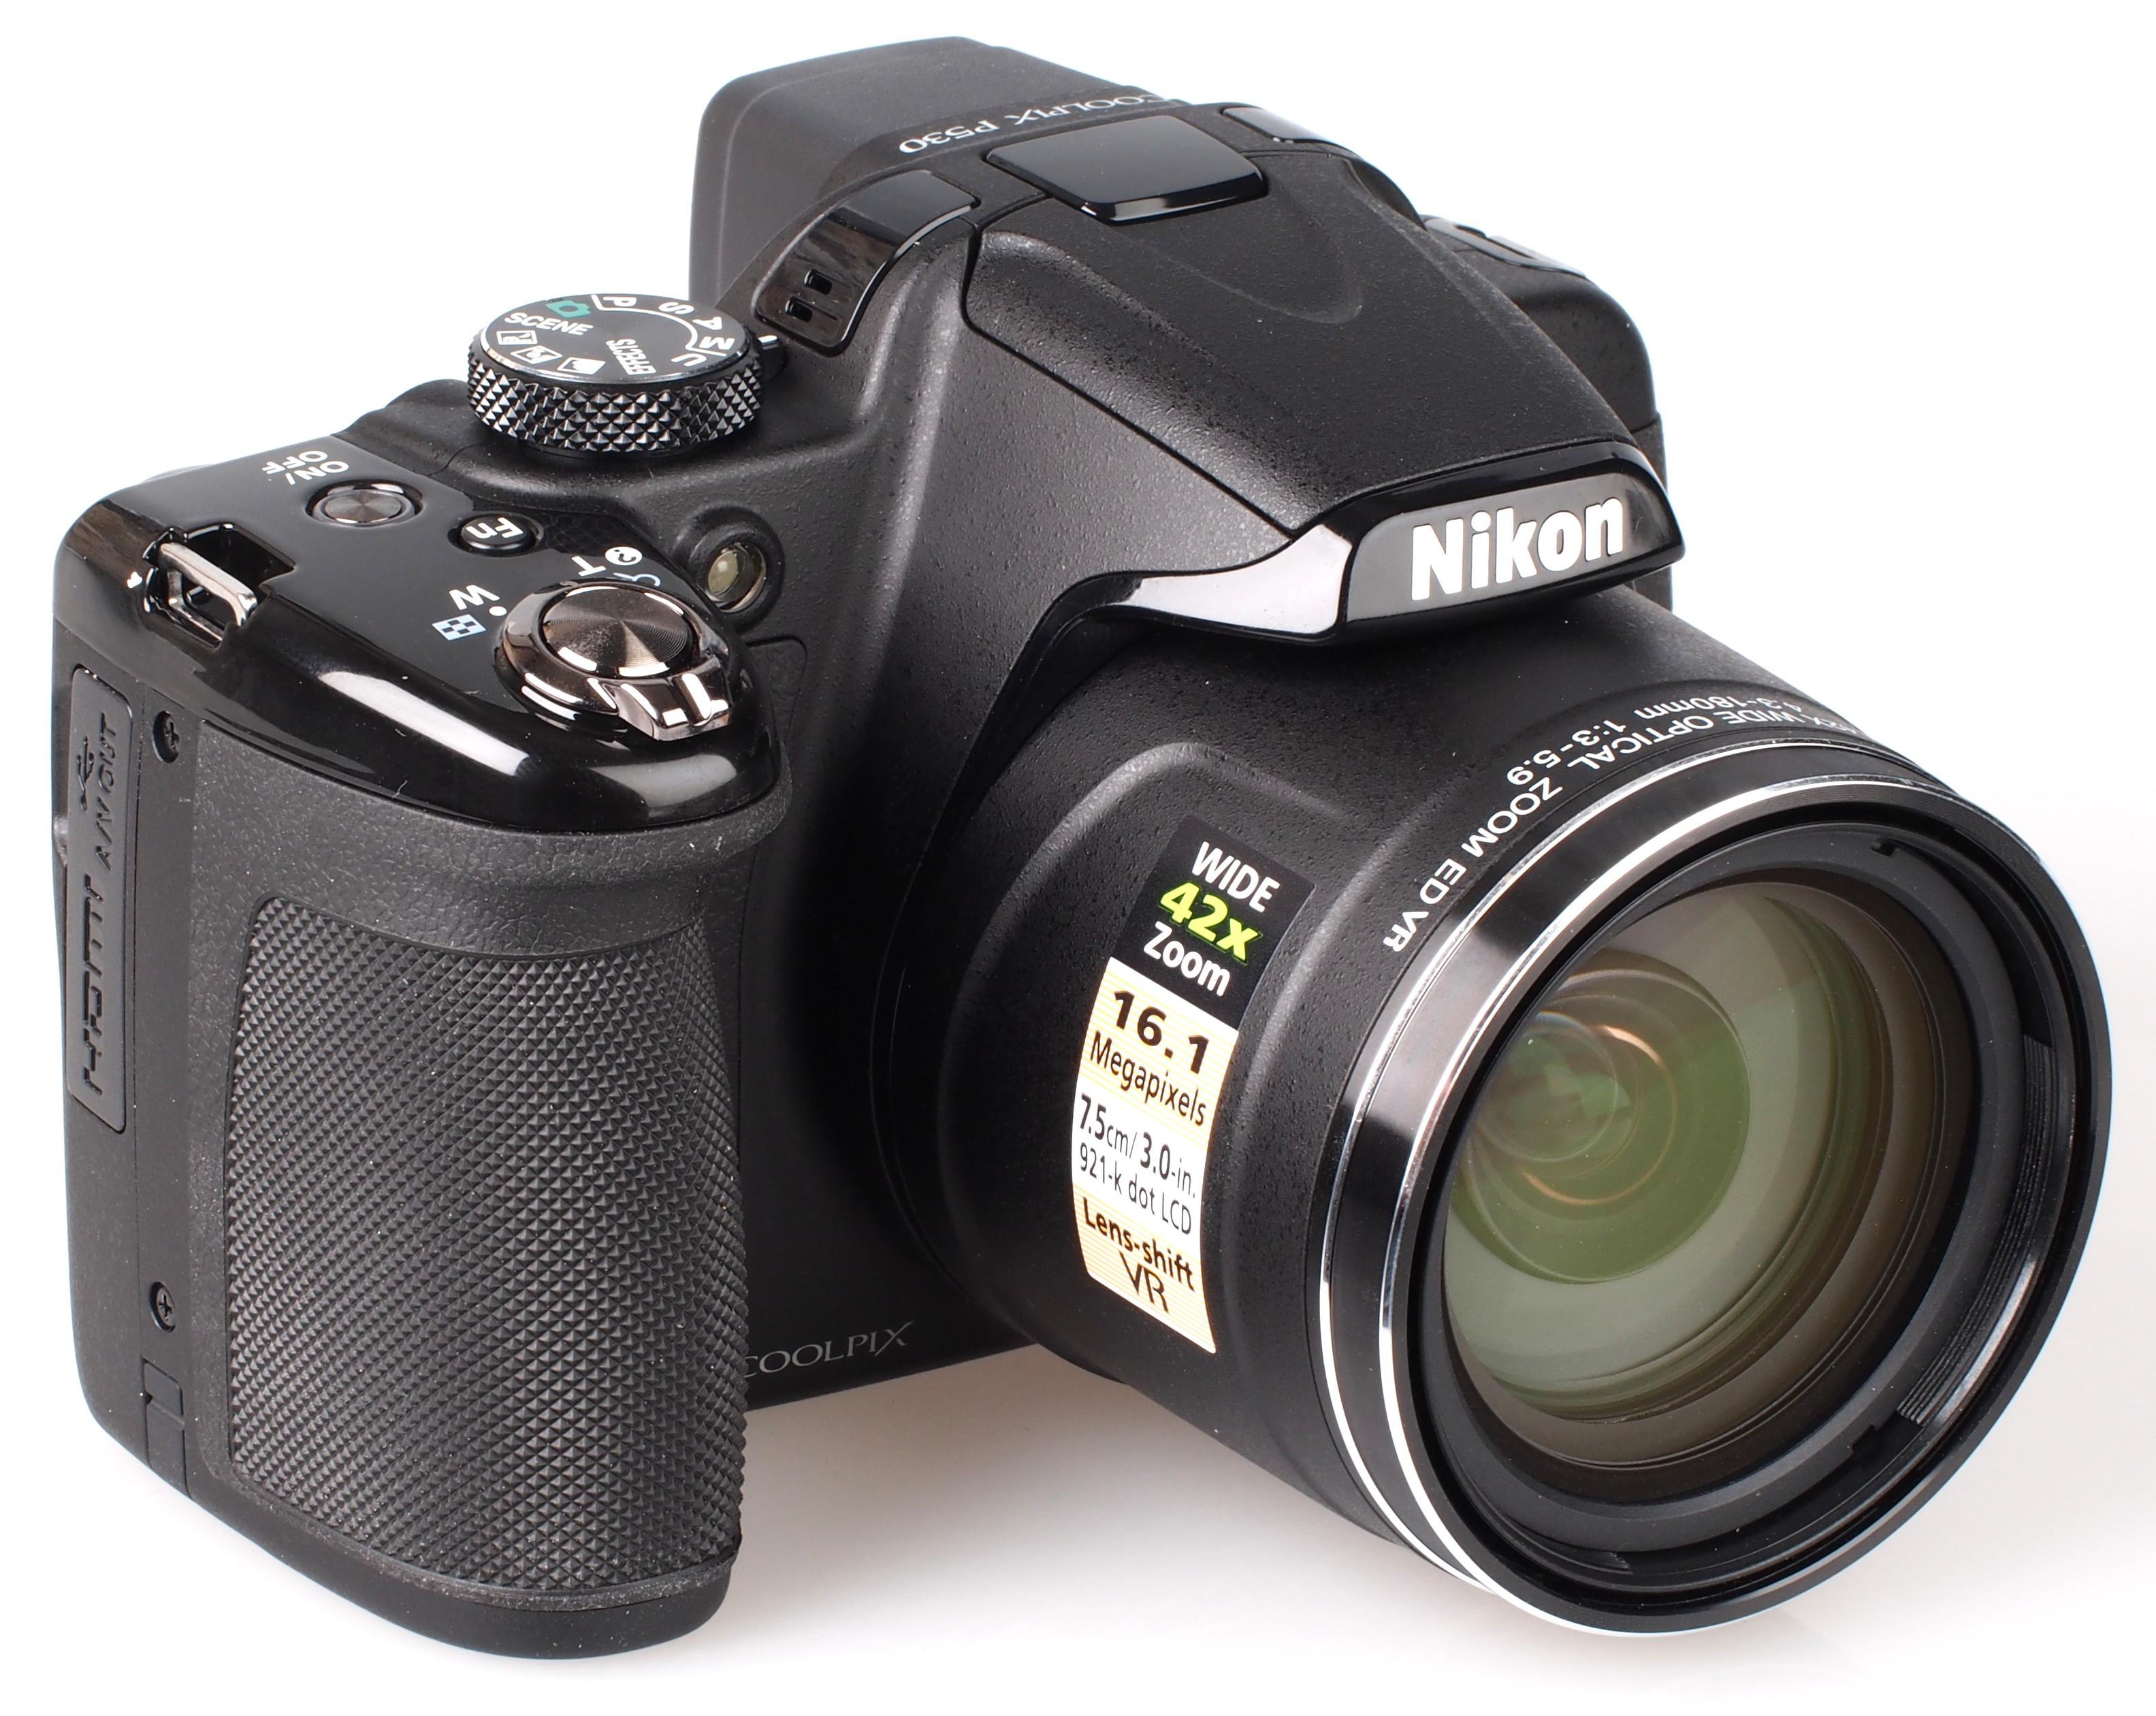 Nikon Coolpix P530 Bridge Camera Review